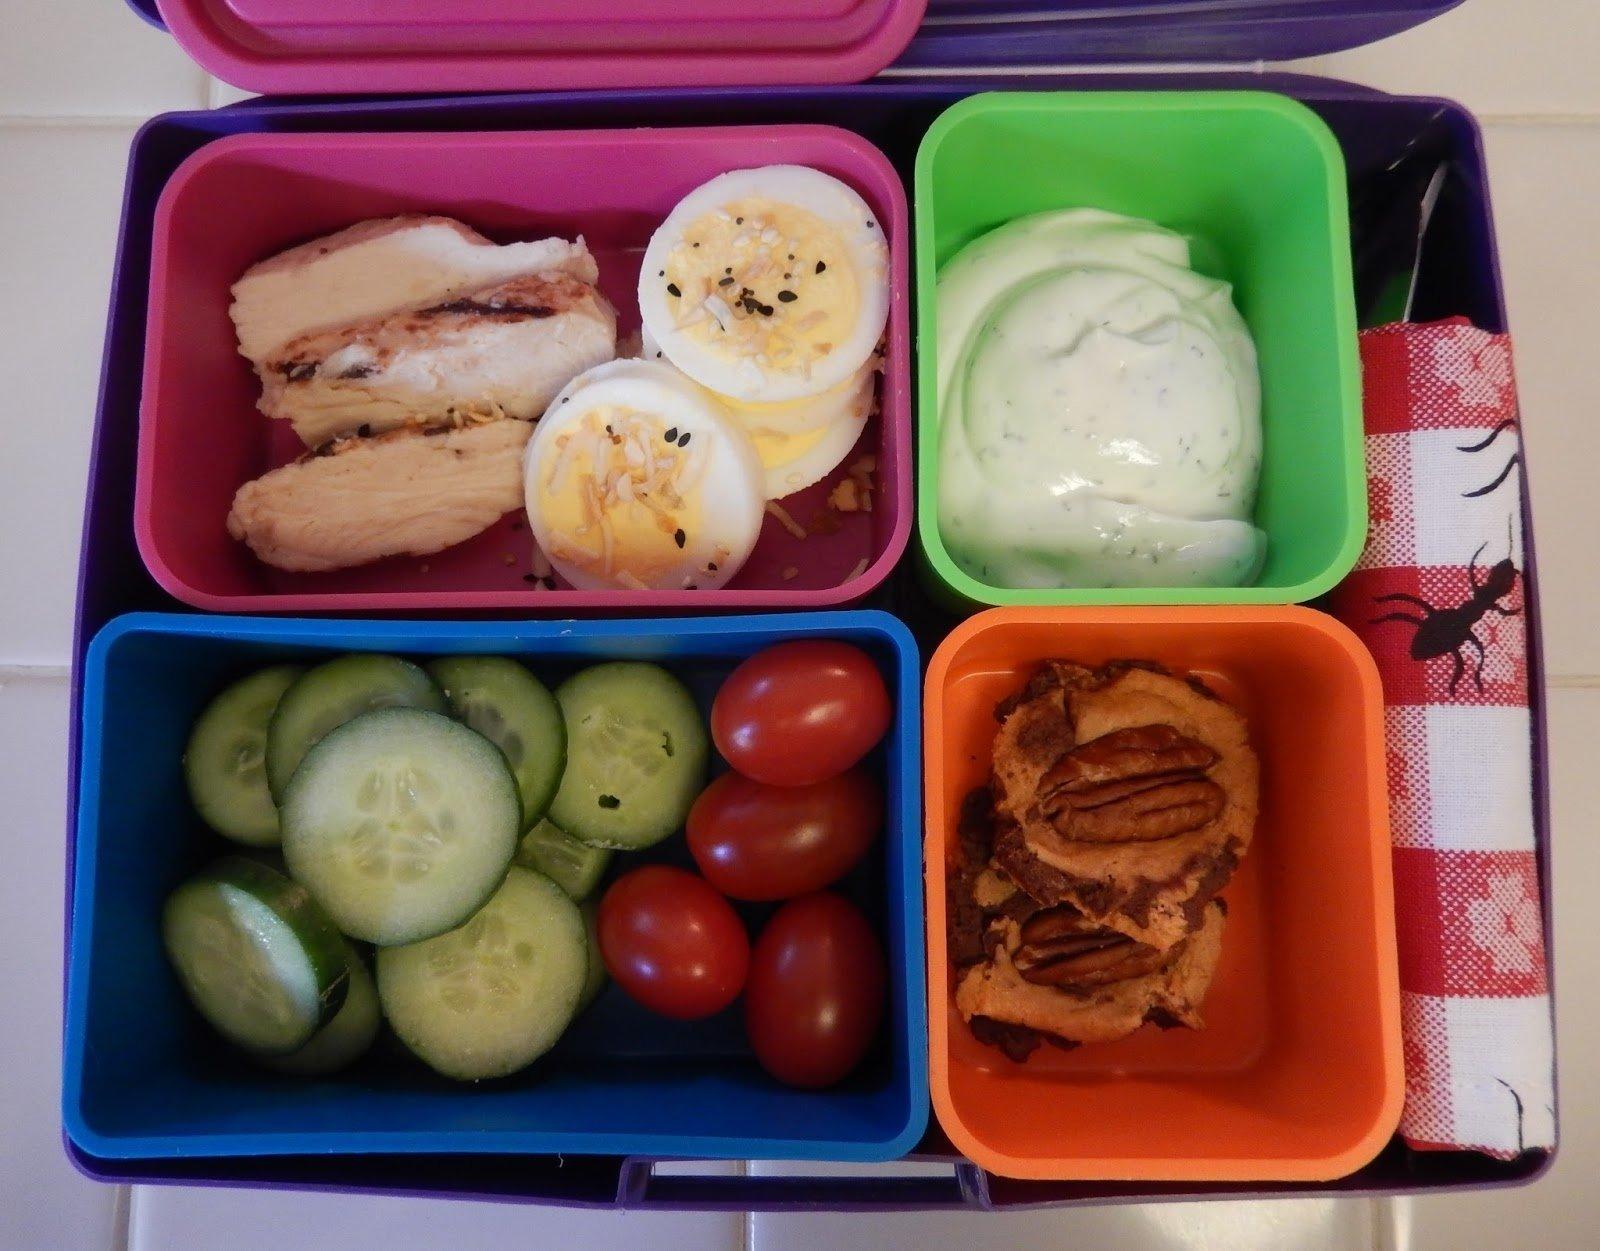 10 Attractive Bento Box Lunch Ideas For Adults theworldaccordingtoeggface bento box lunches 2021